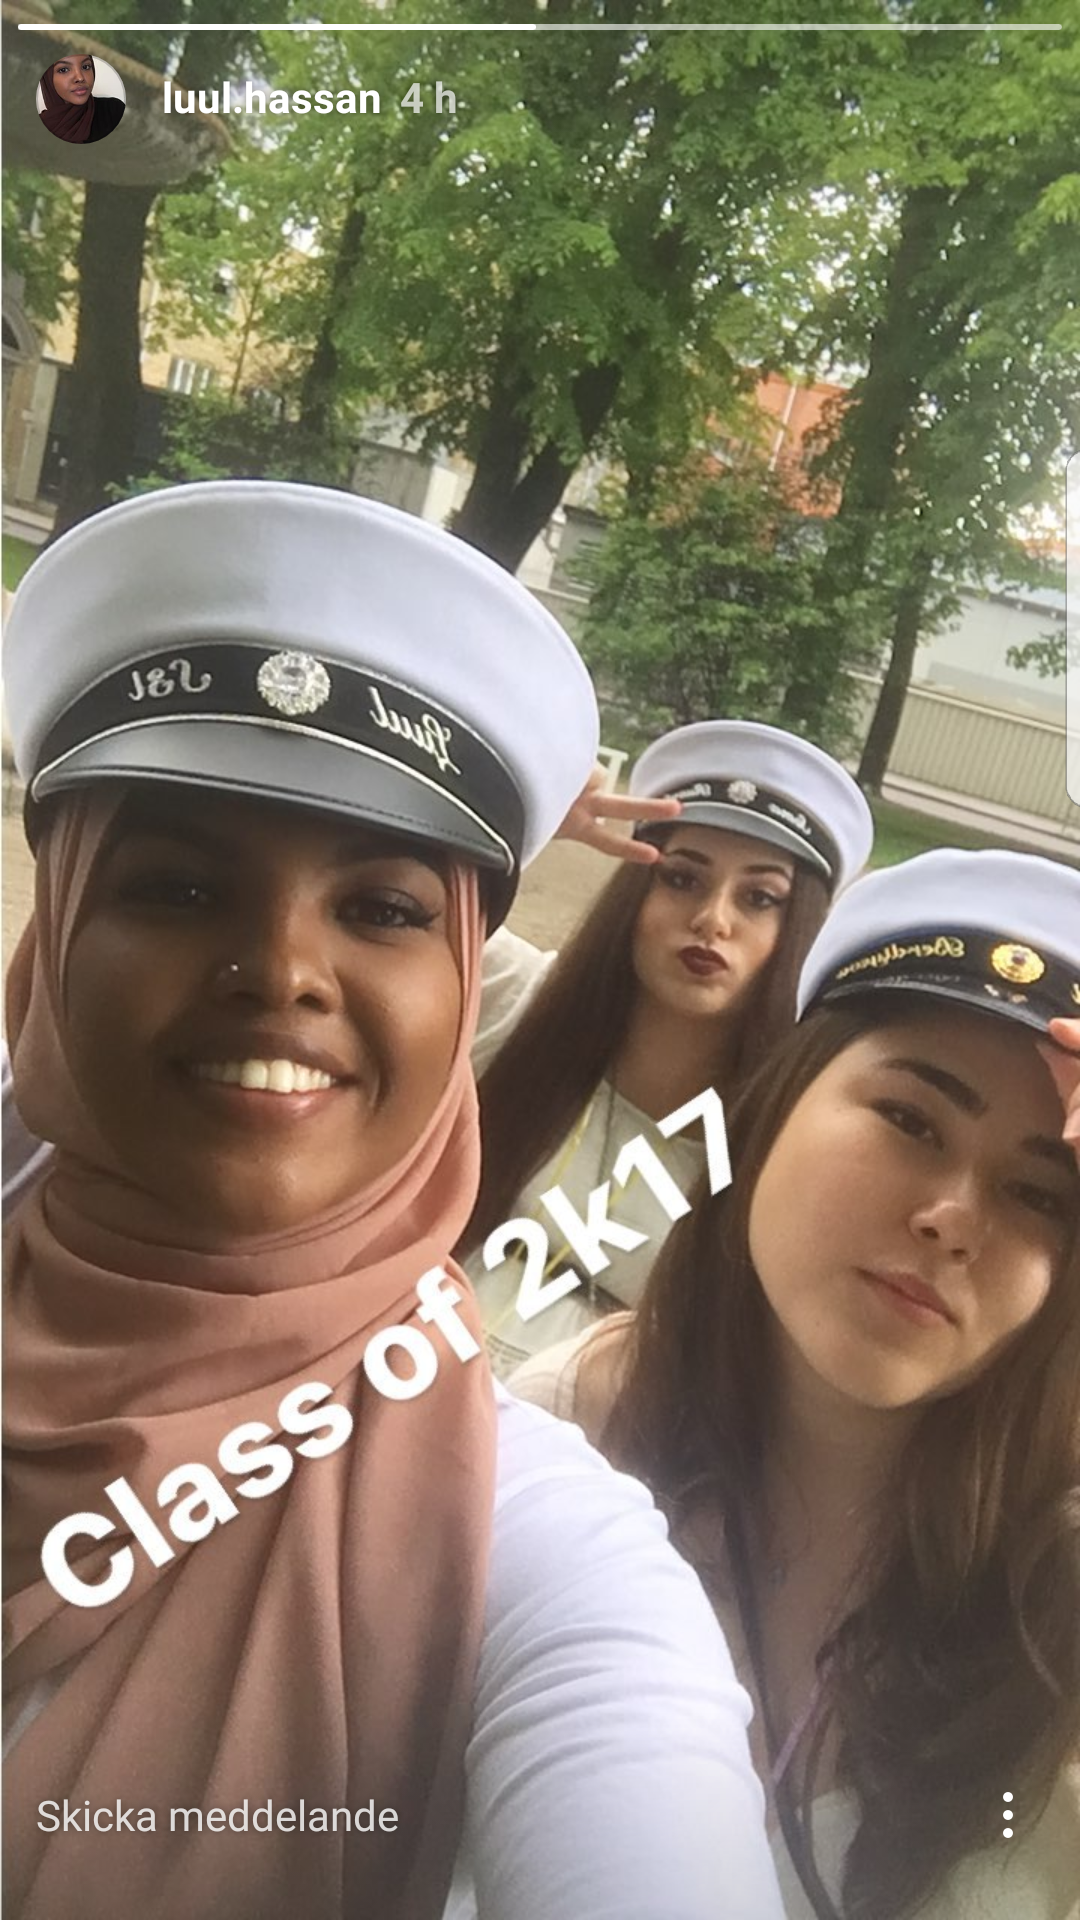 Tbt to my graduation